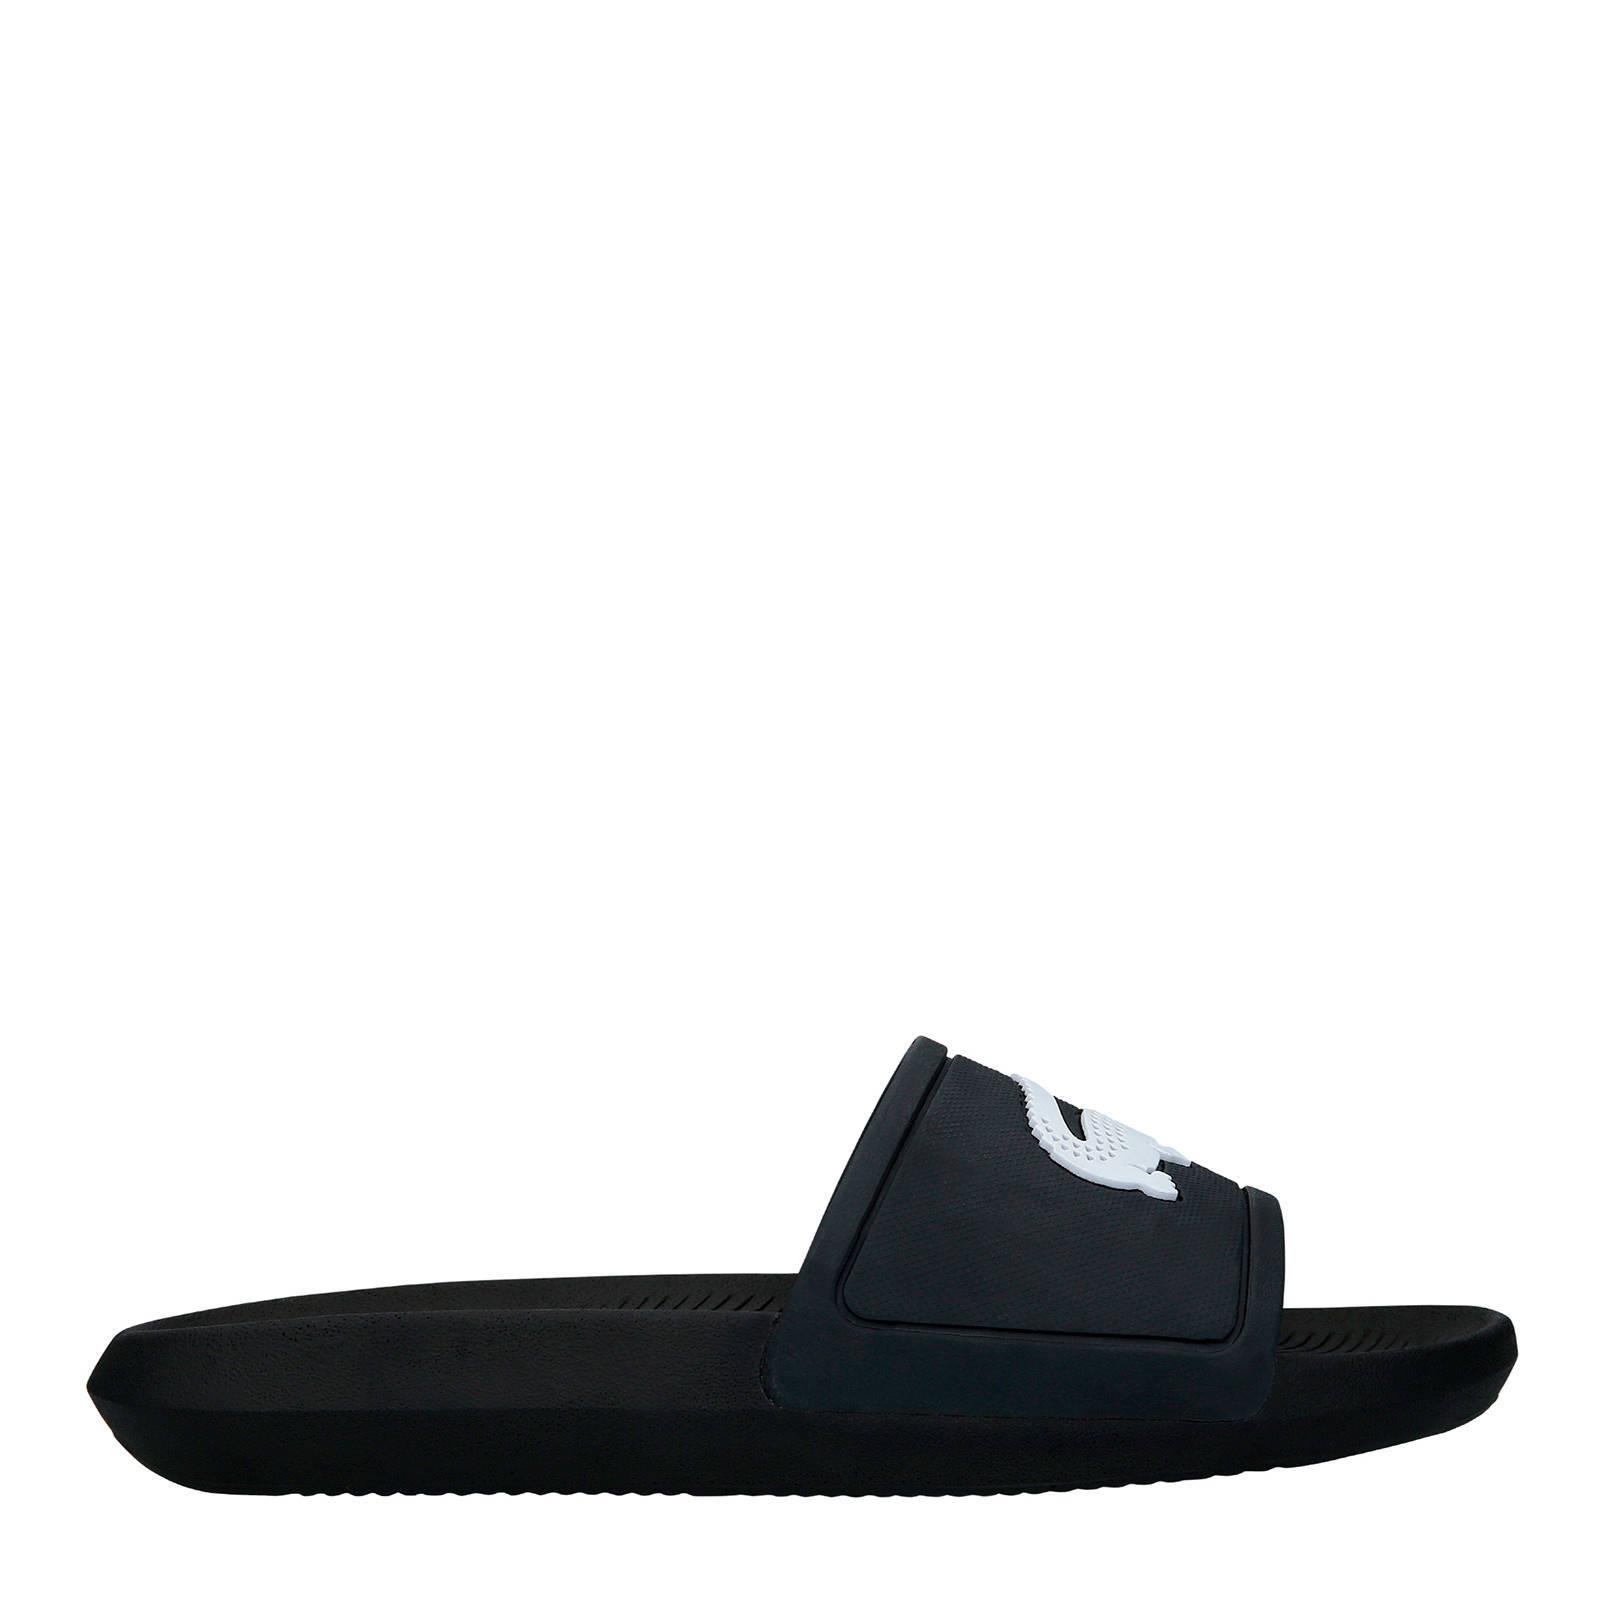 wit 119 zwart Slide badslippers Lacoste Croco xqwZXXU